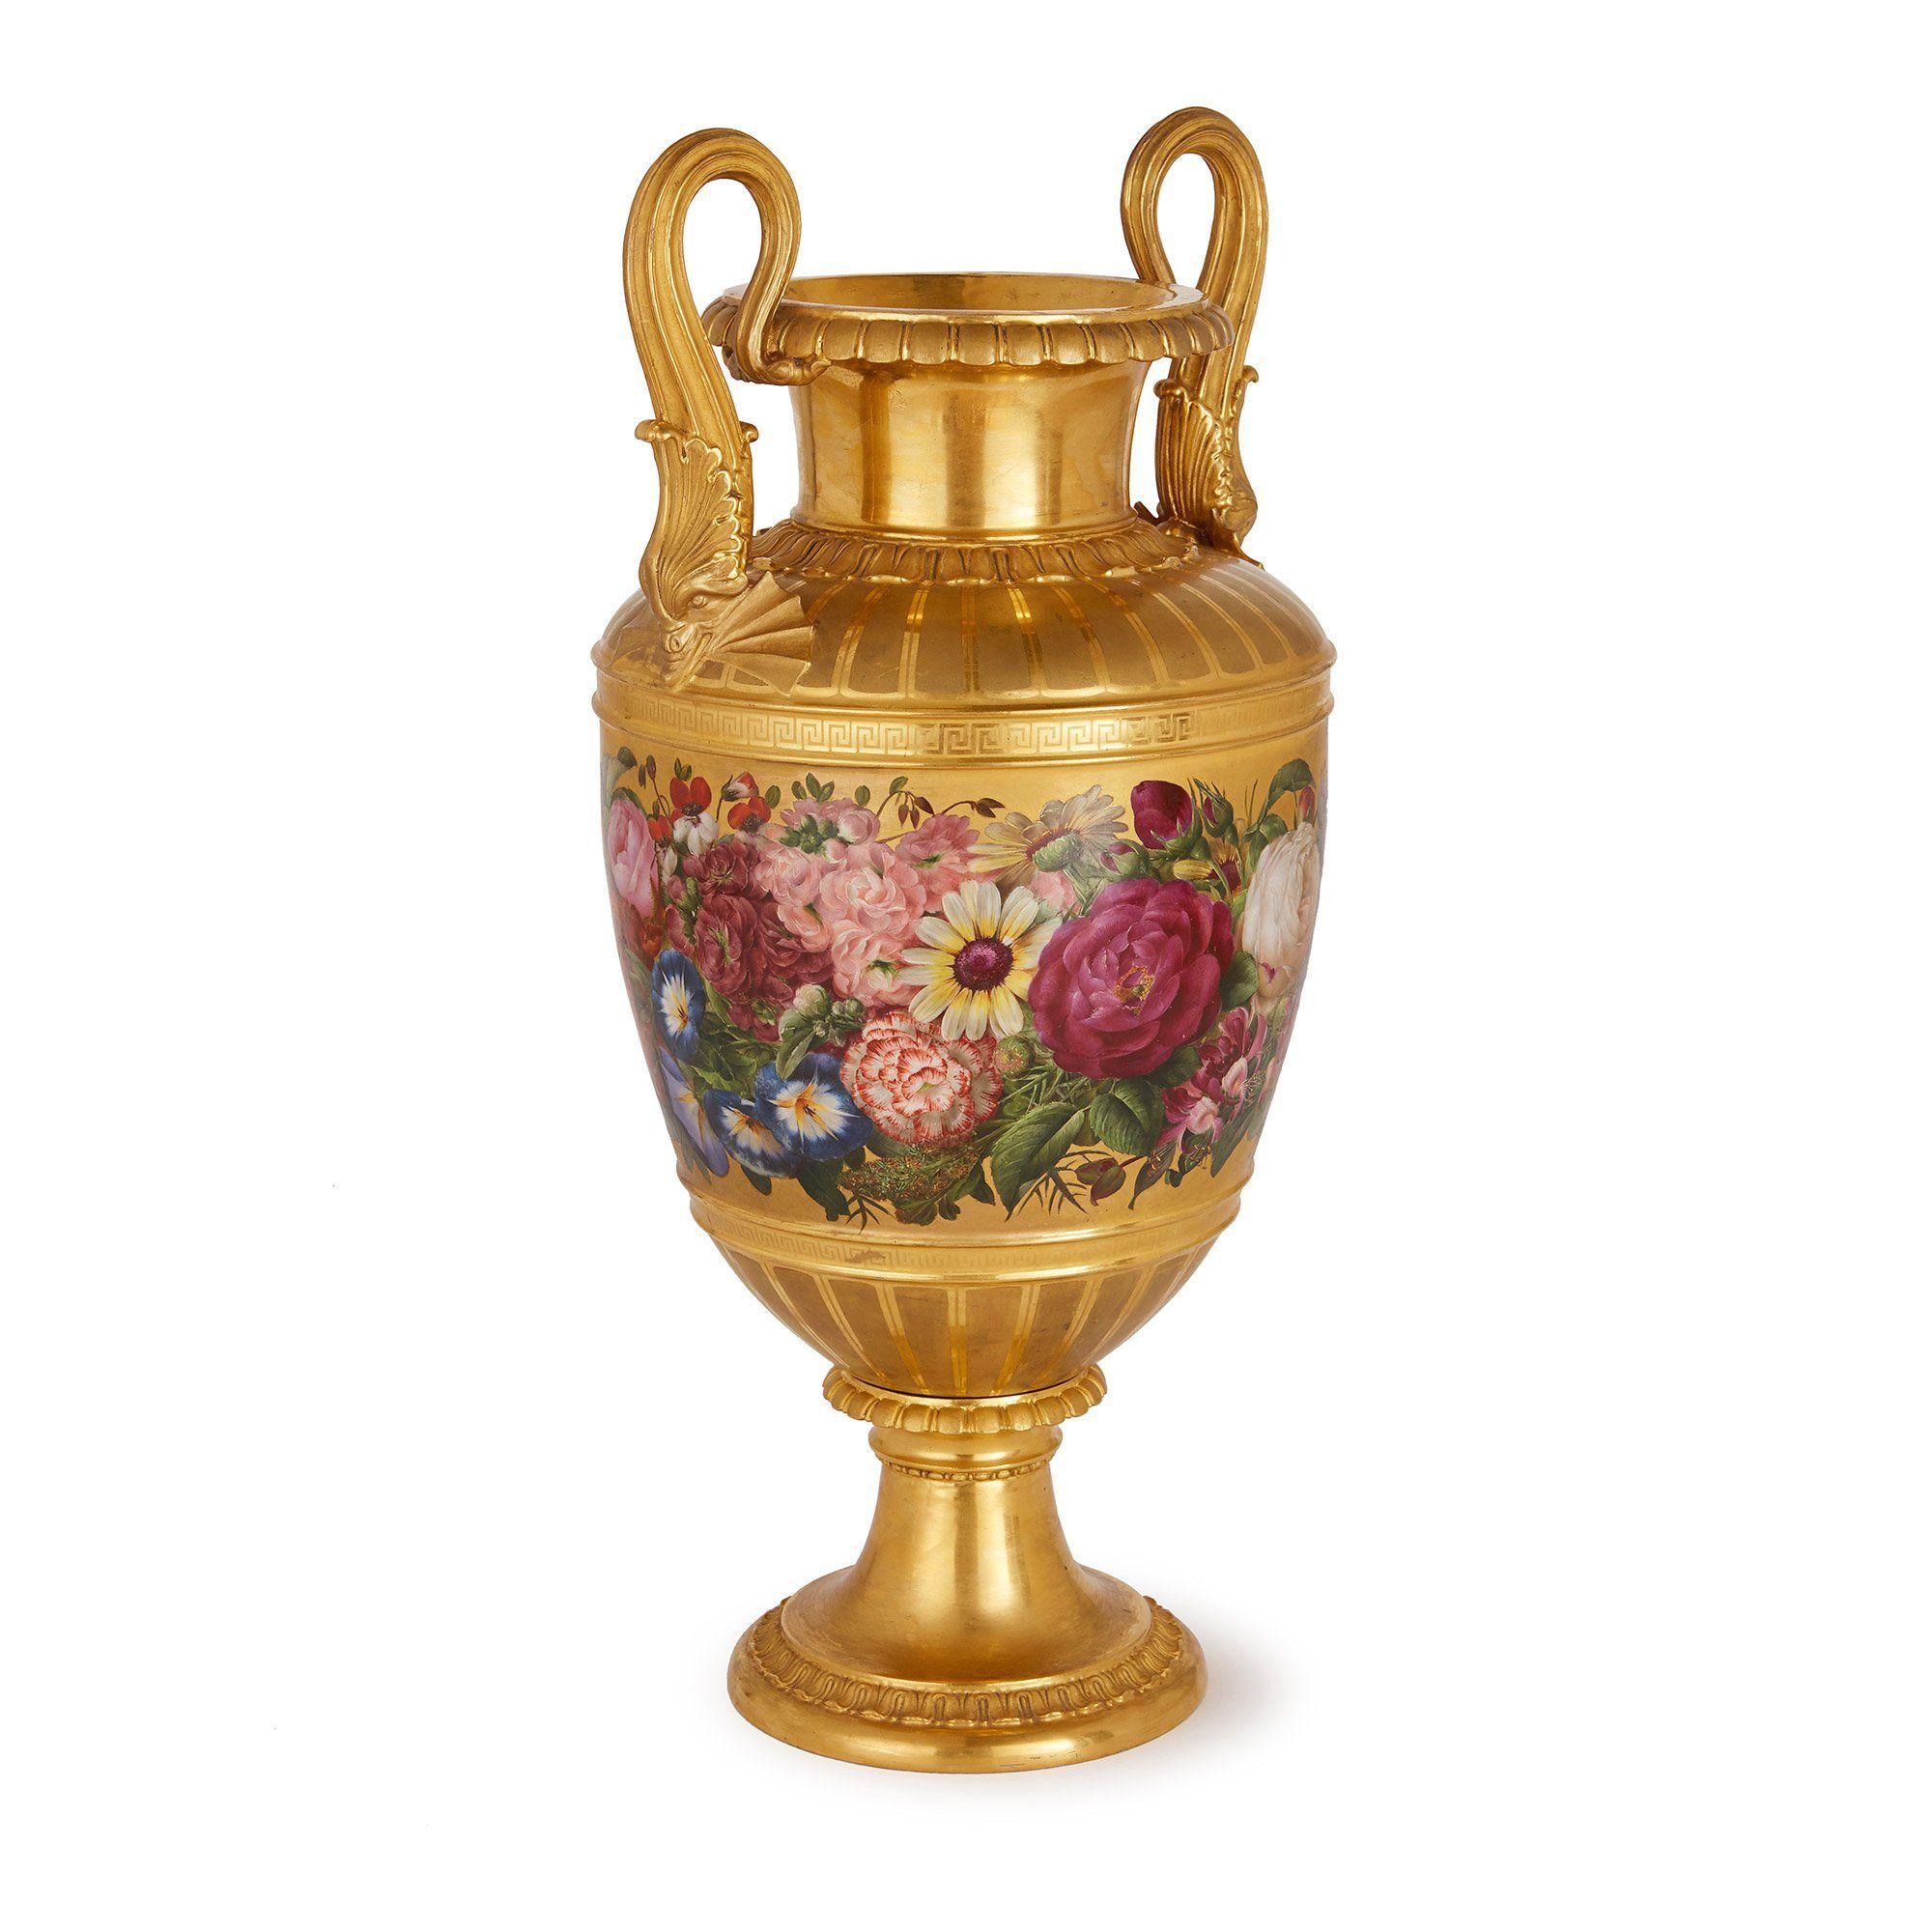 Royal Copenhagen Gilt Ground Antique Porcelain Vase